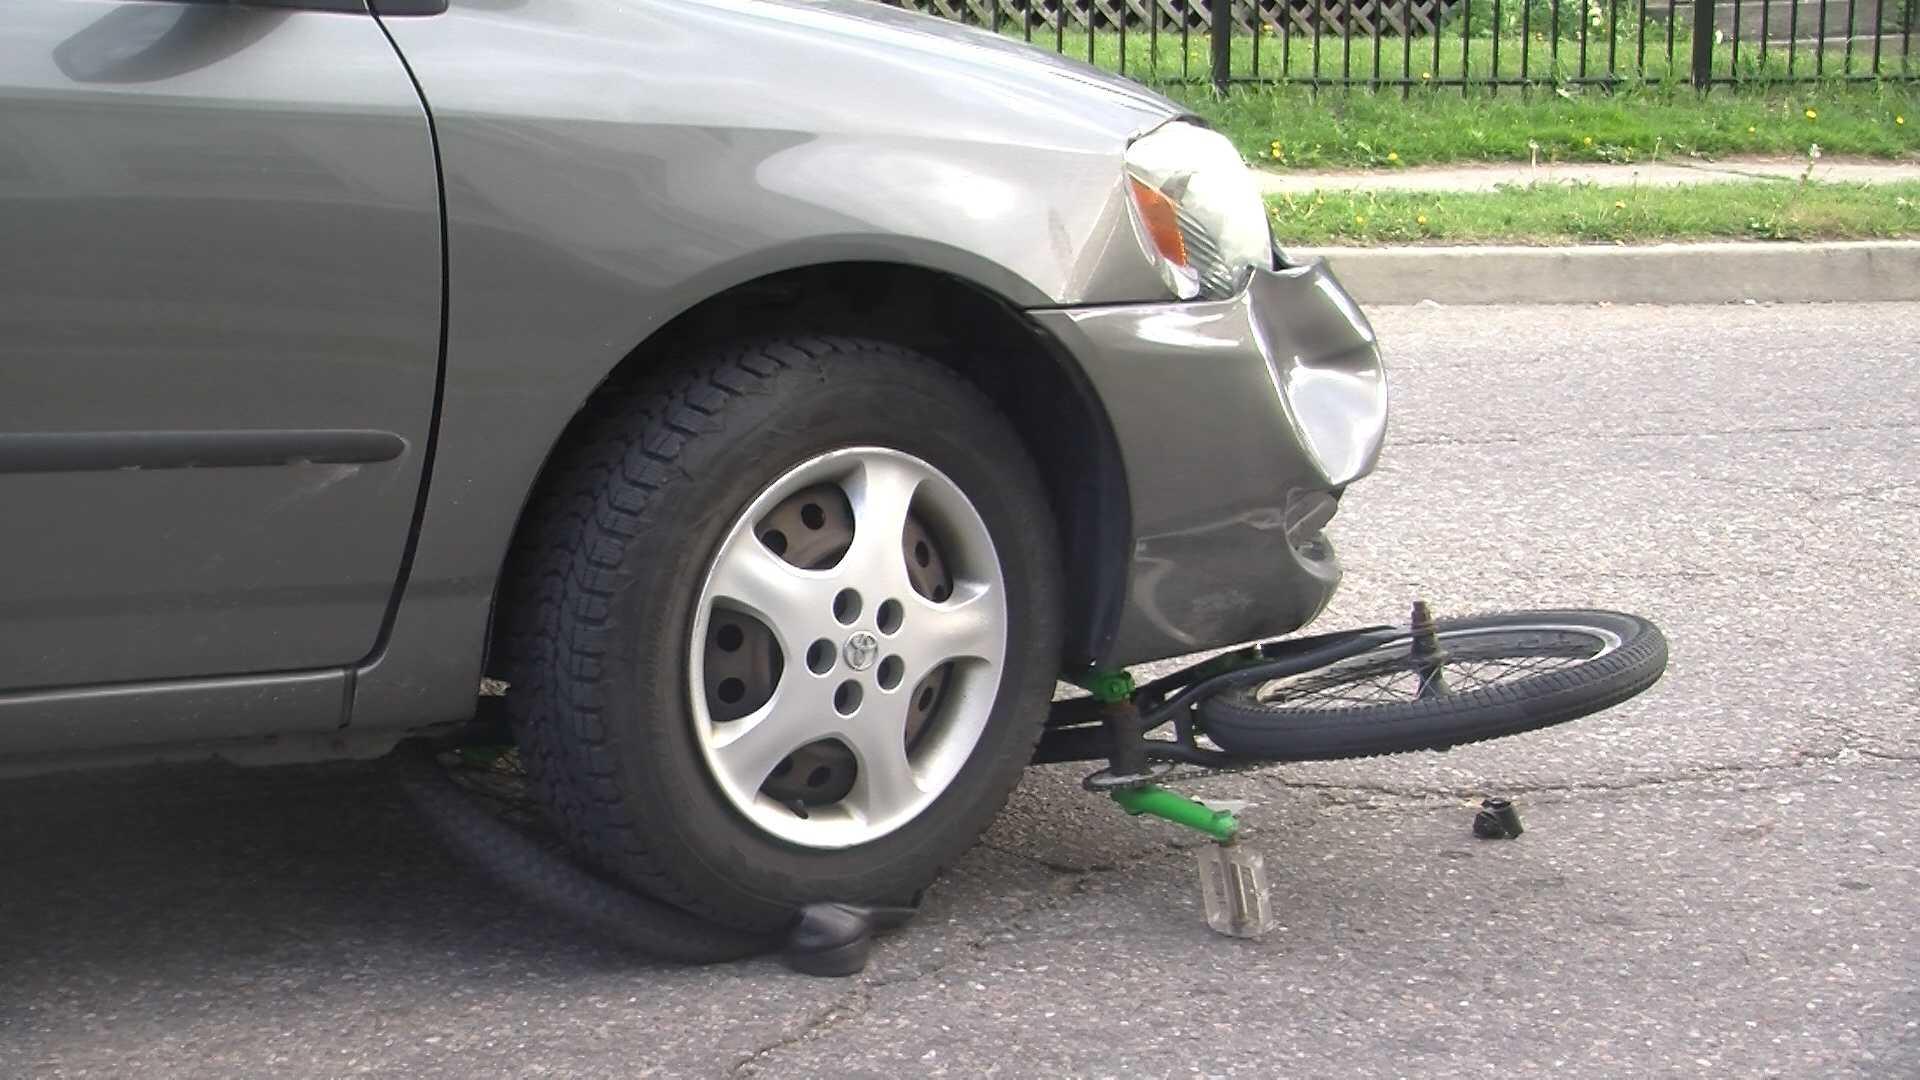 05-12-13 Car hits biker in Winooski - img